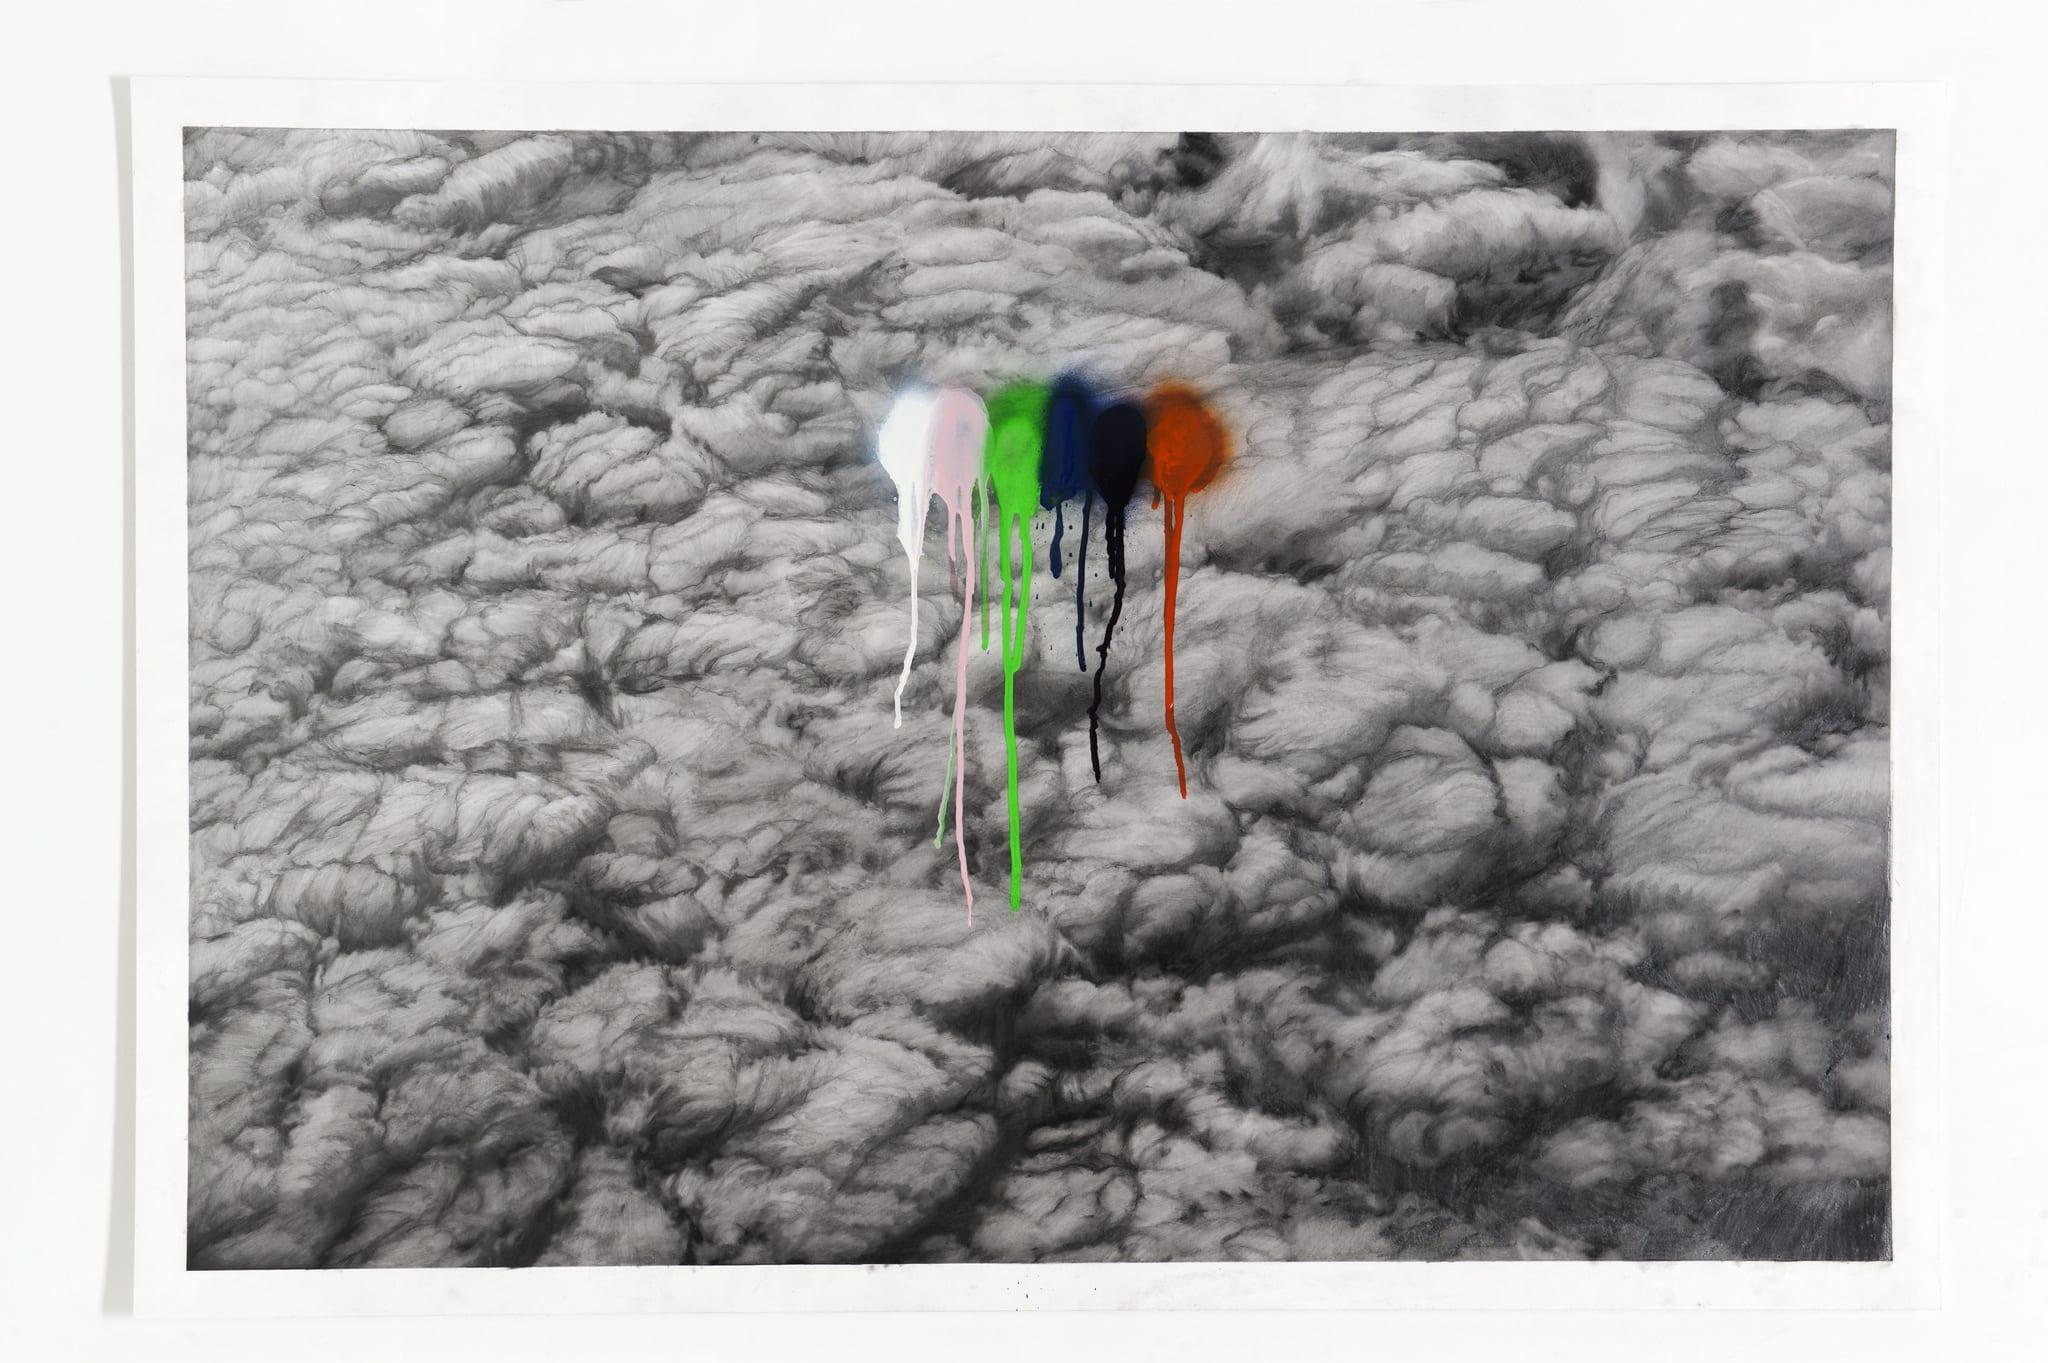 Rainbow herbicides by Thu Van Tran